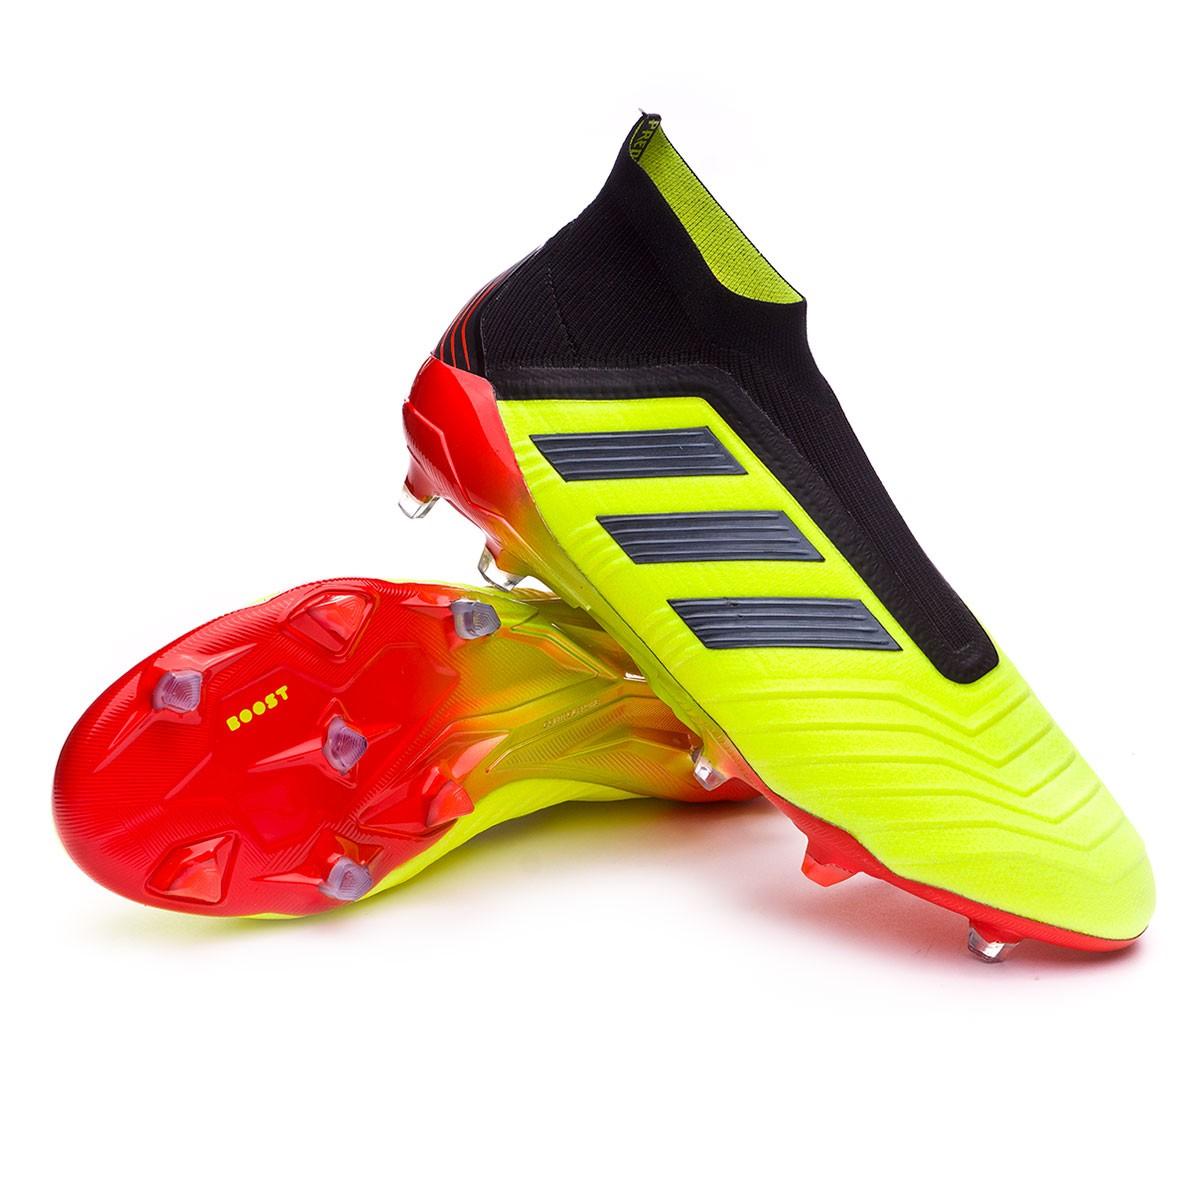 1826b77c3166 Boot adidas Predator 18+ FG Solar yellow-Black-Solar red - Football ...